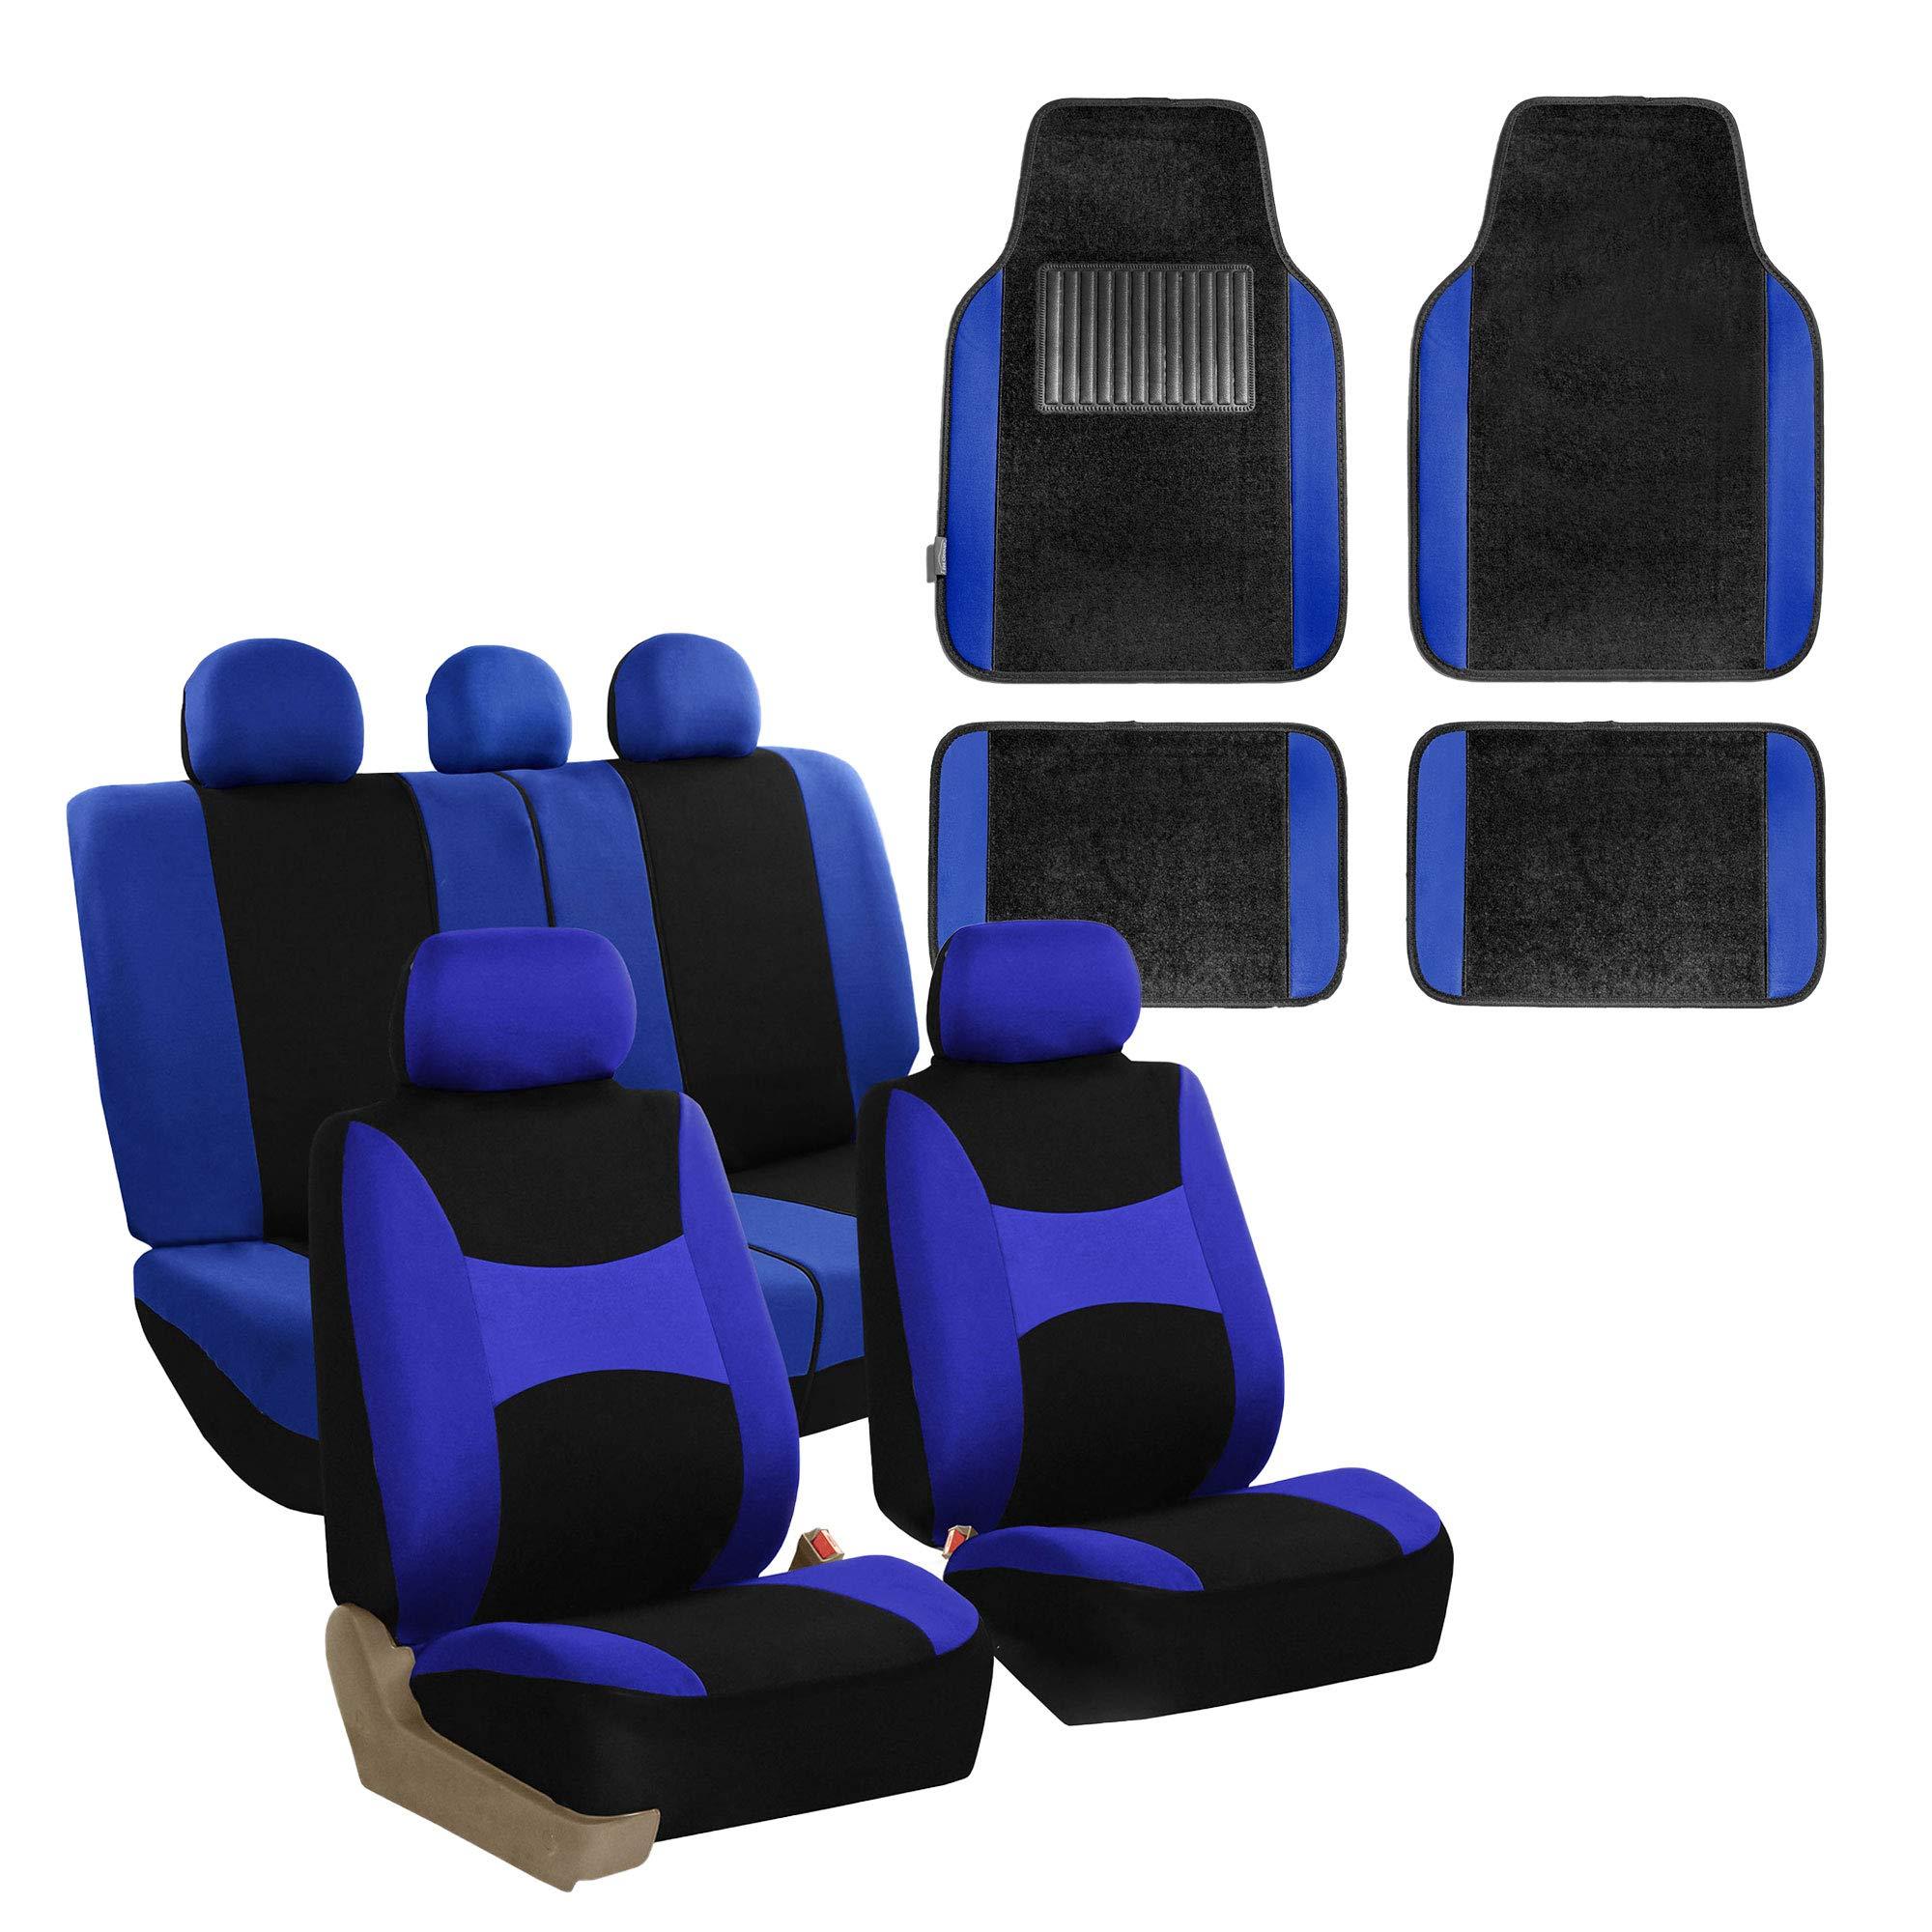 FH FH FB030115 Breezy Airbag Premium